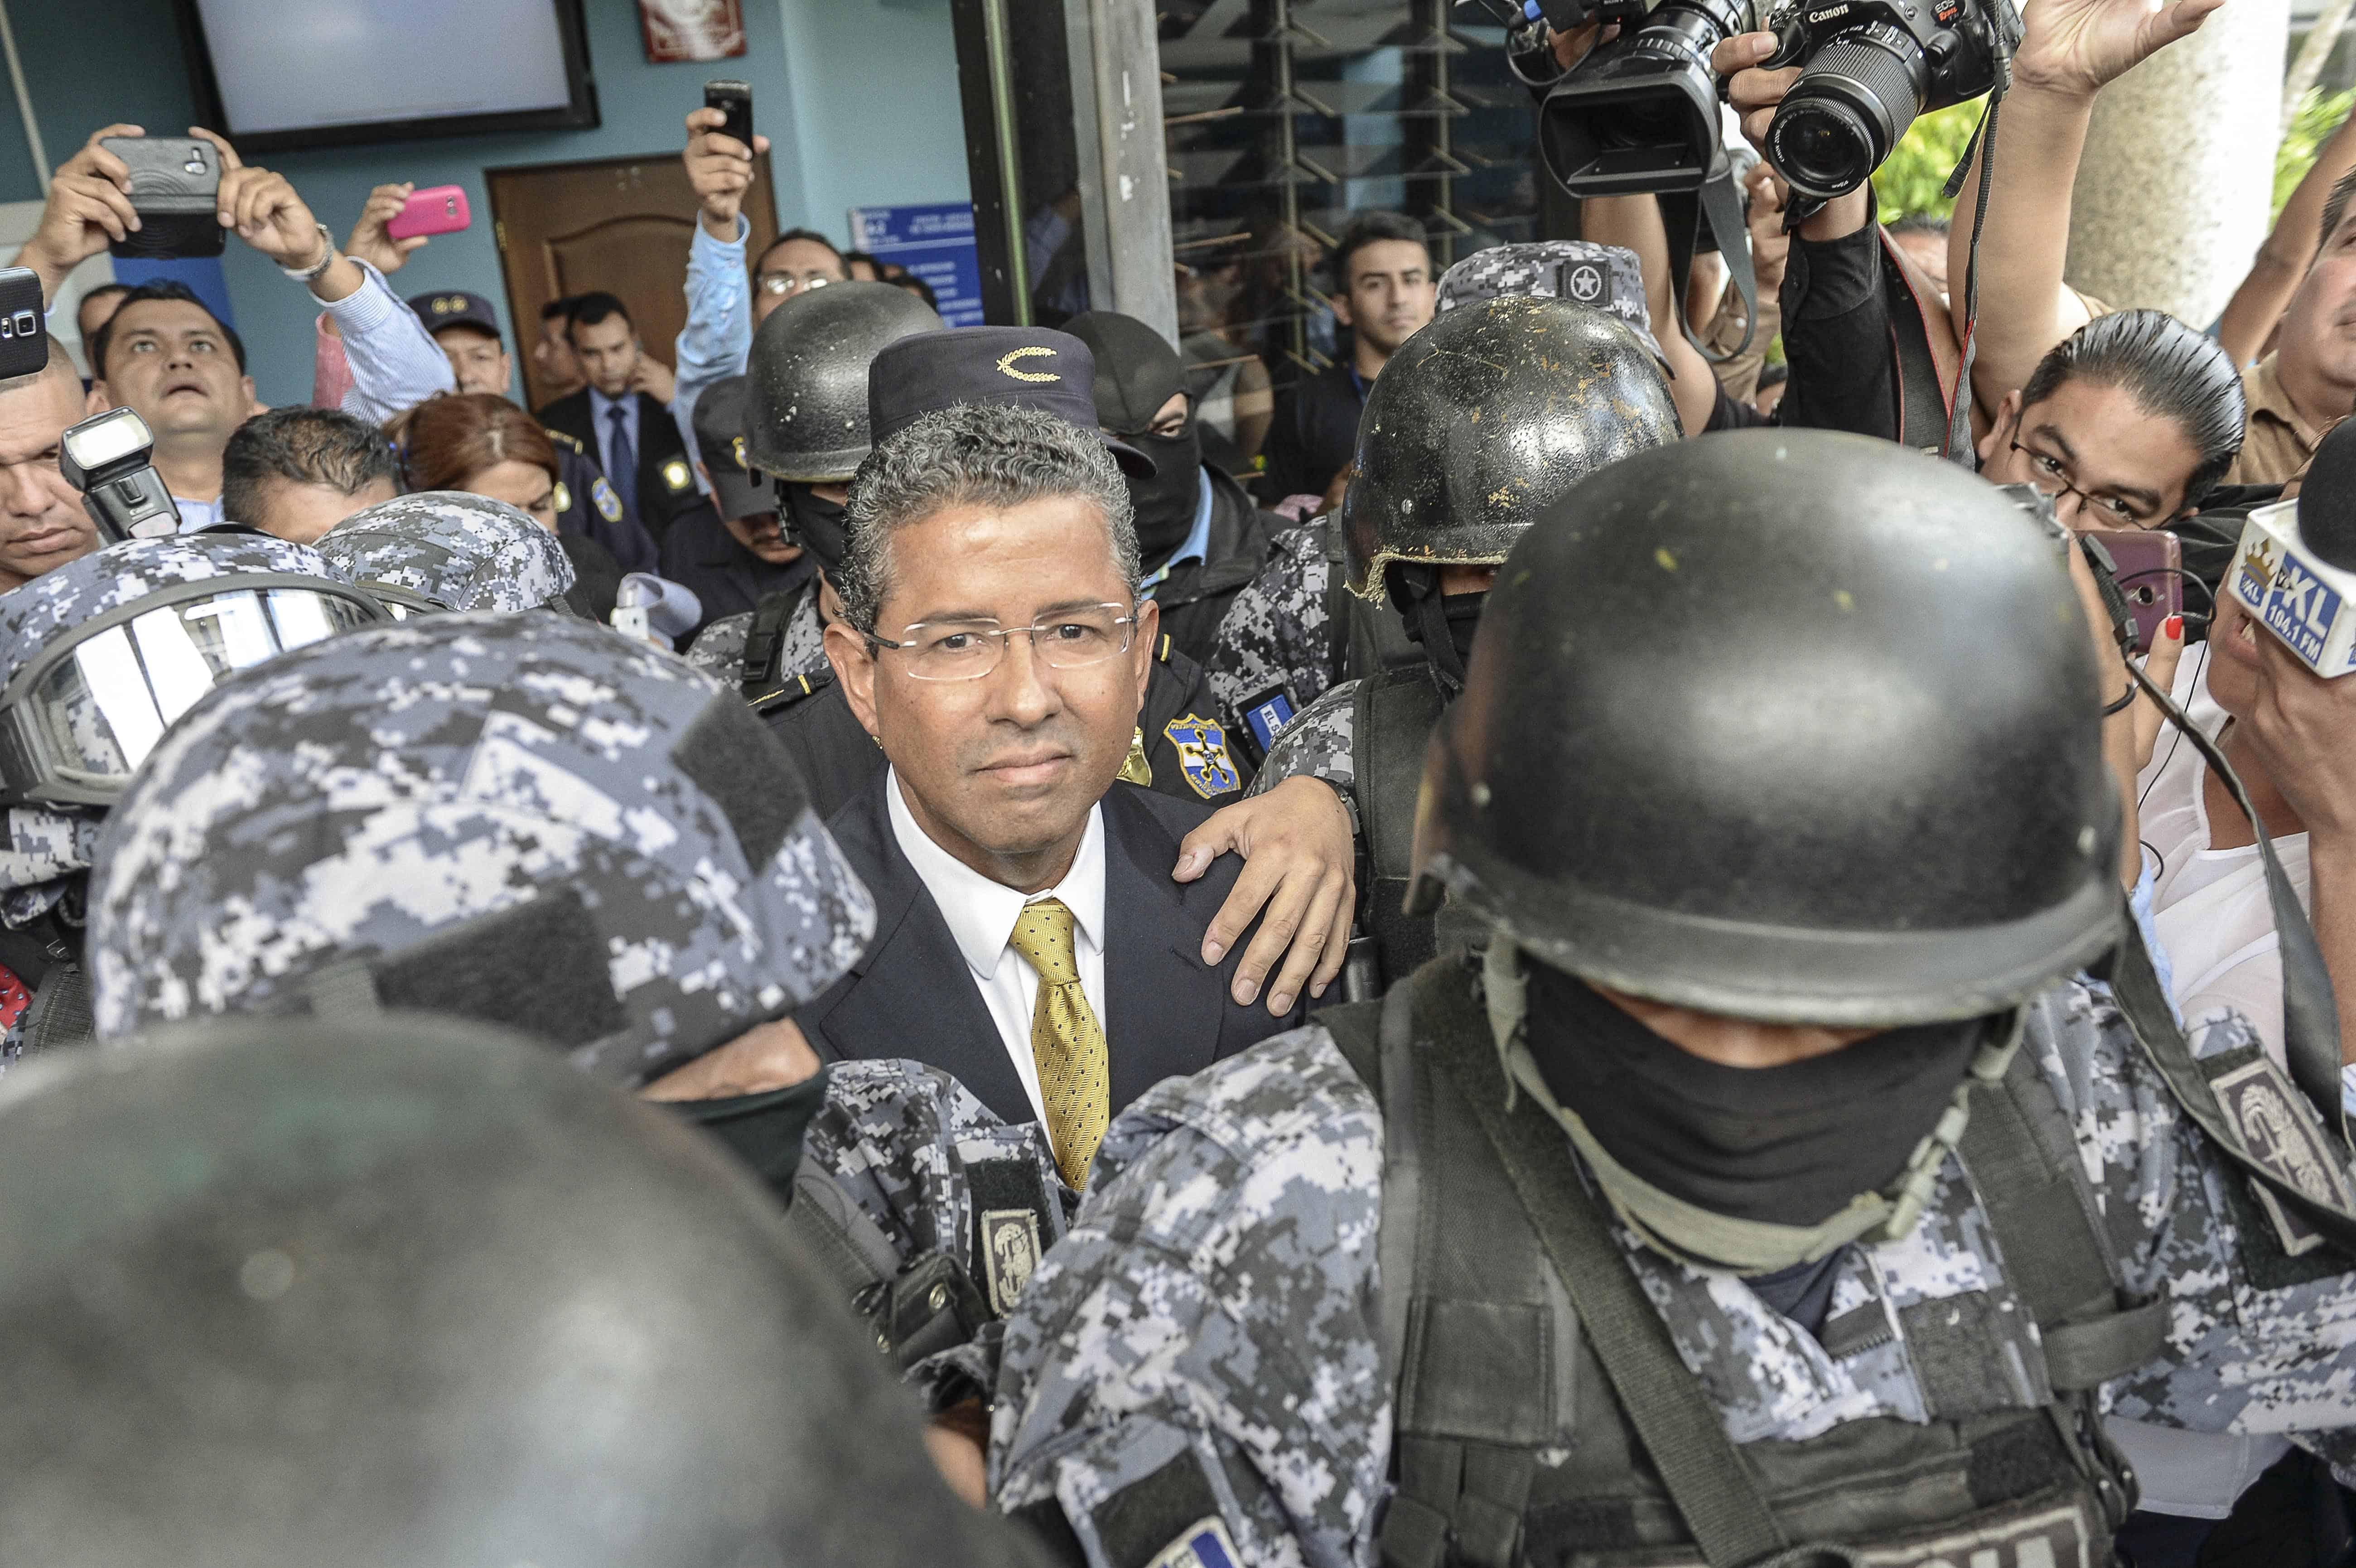 El Salvador ex-President Francisco Flores